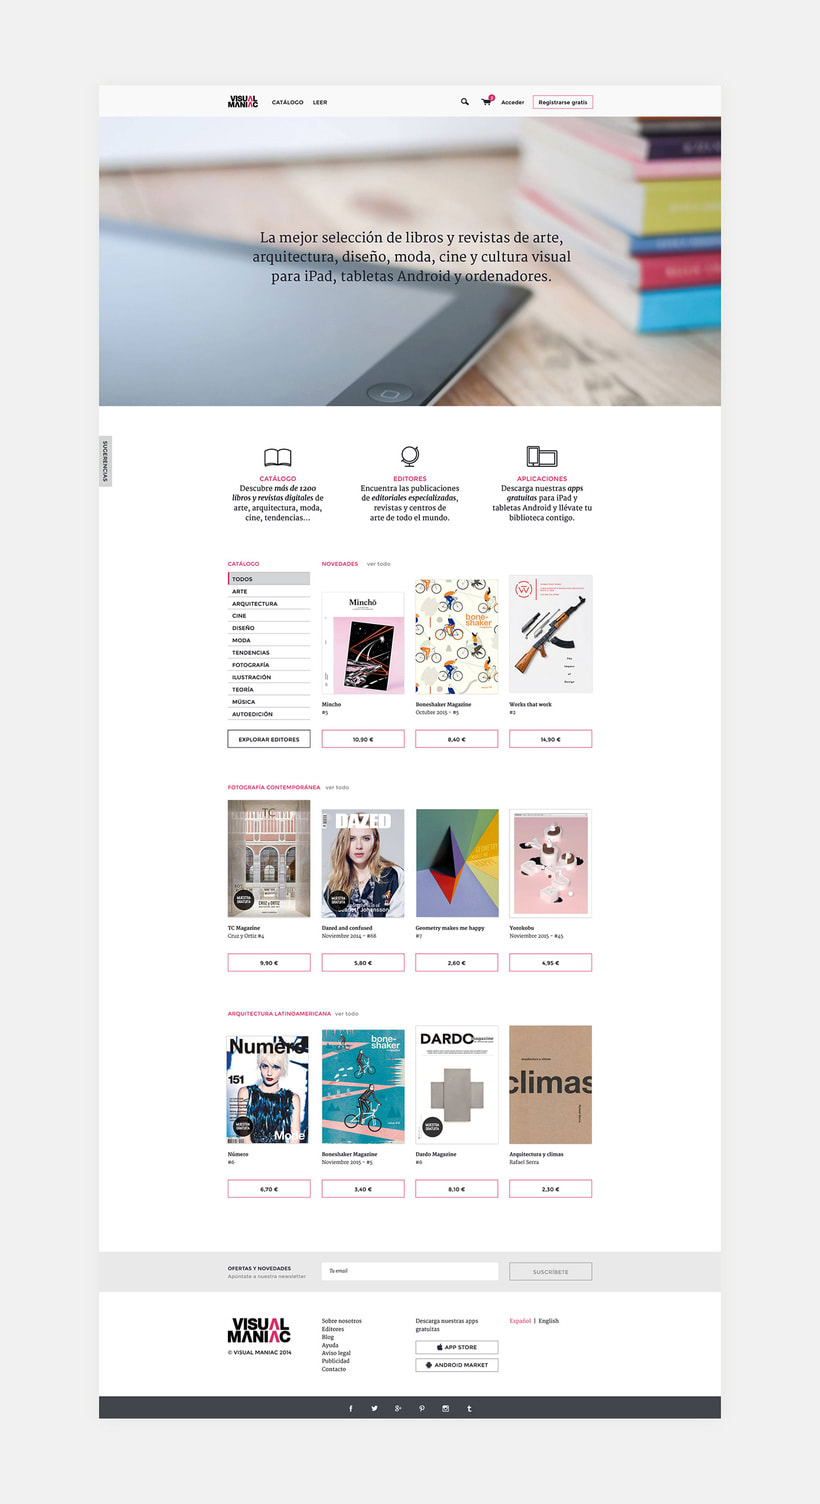 Visualmaniac digital bookstore 3